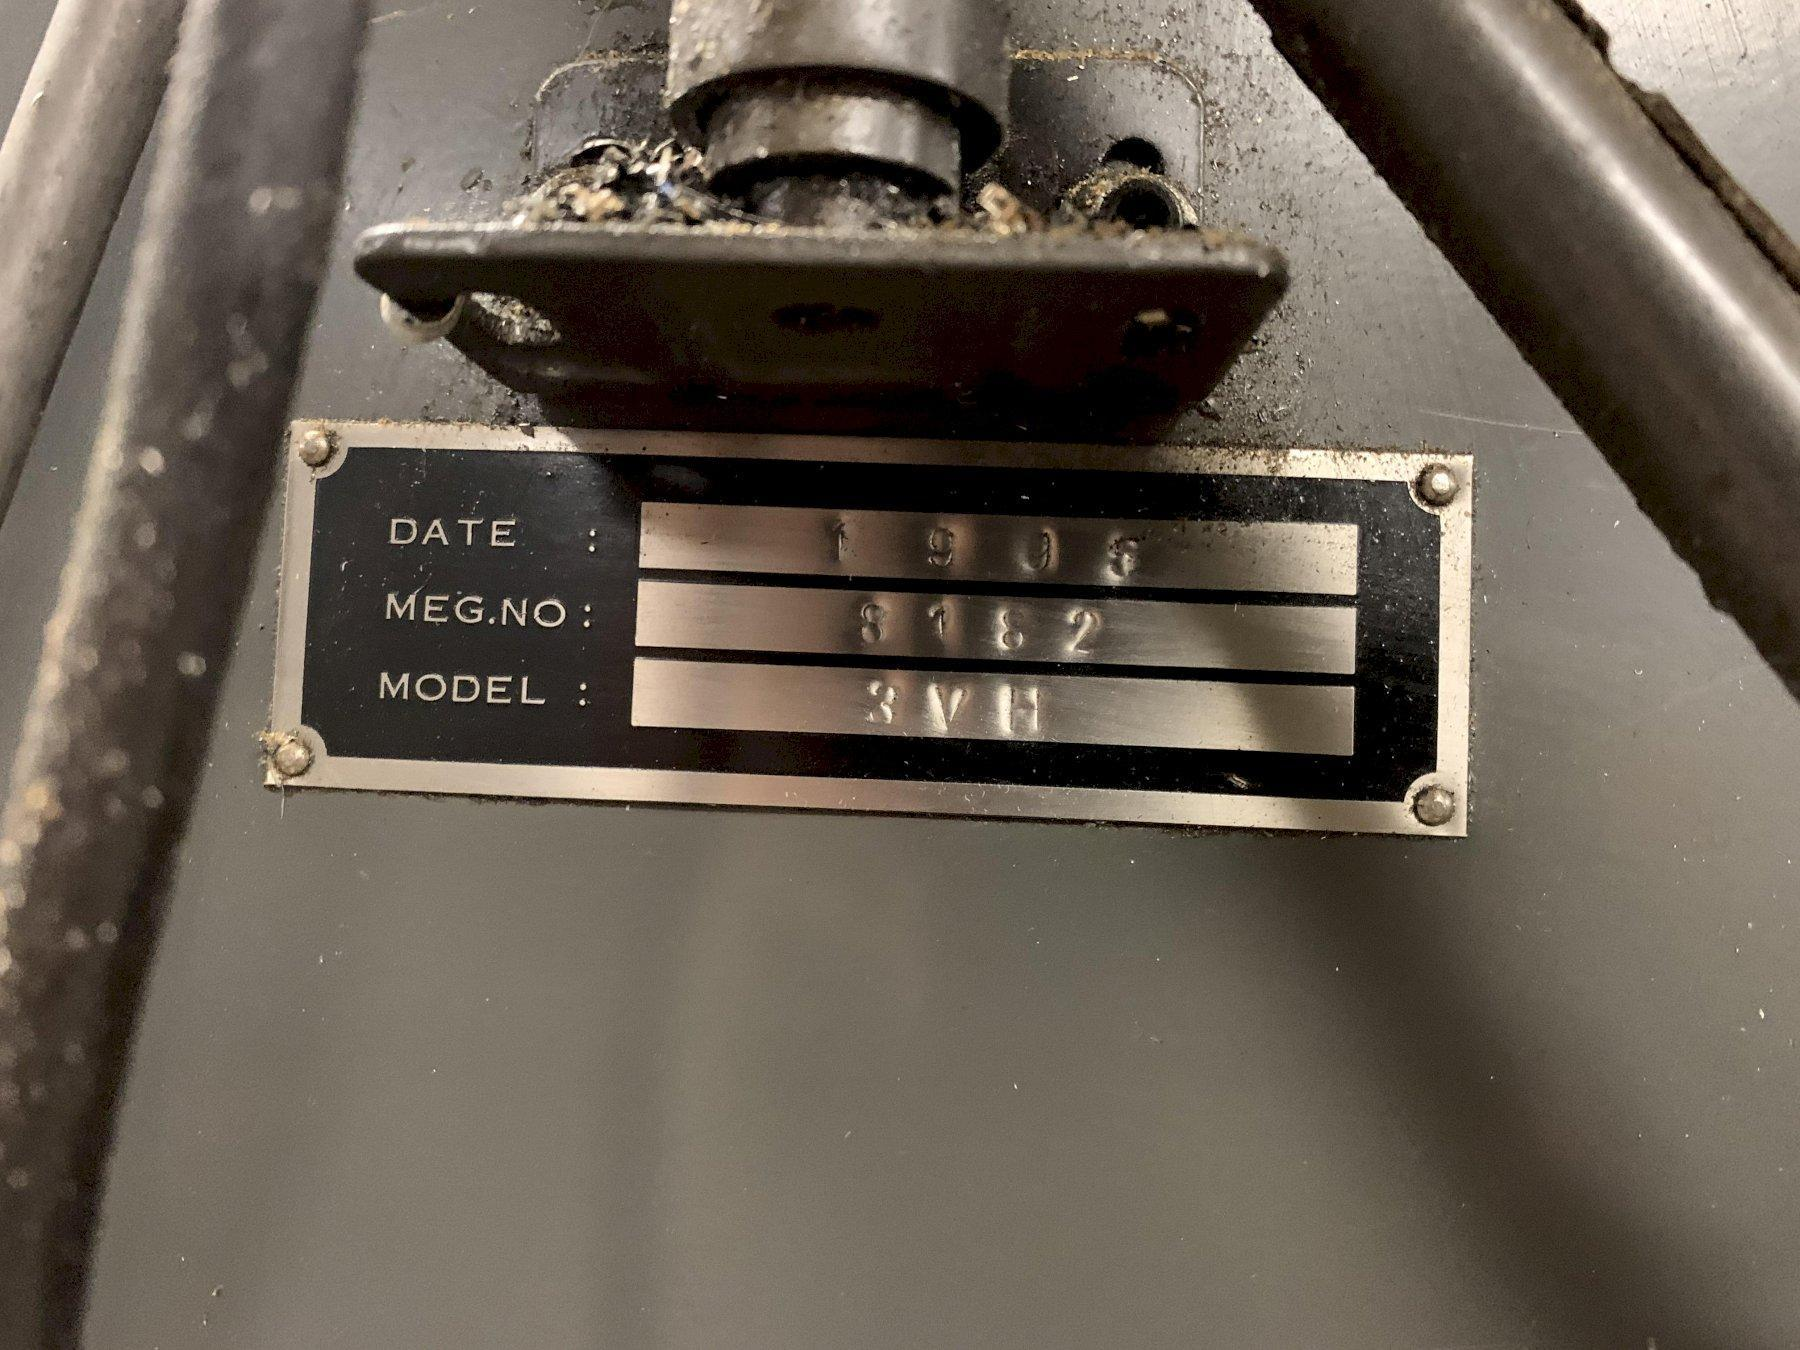 Seiki Model 3VS Variable Speed Vertical Mill, S/N 8182, New 1995.